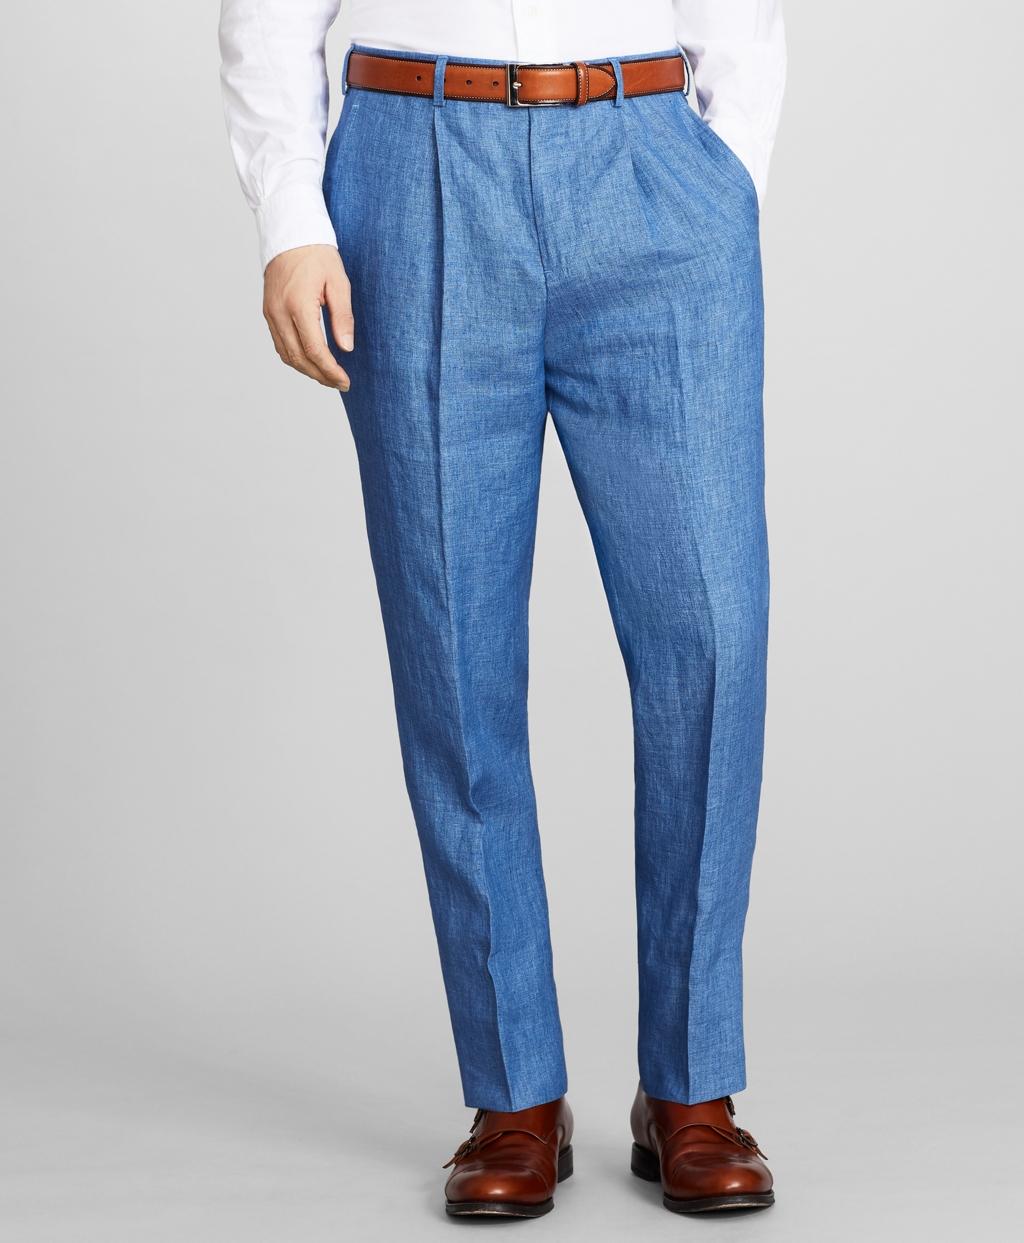 Men's Vintage Pants, Trousers, Jeans, Overalls Brooks Brothers Mens Slim Fit Single-Pleat Linen Trousers $198.00 AT vintagedancer.com